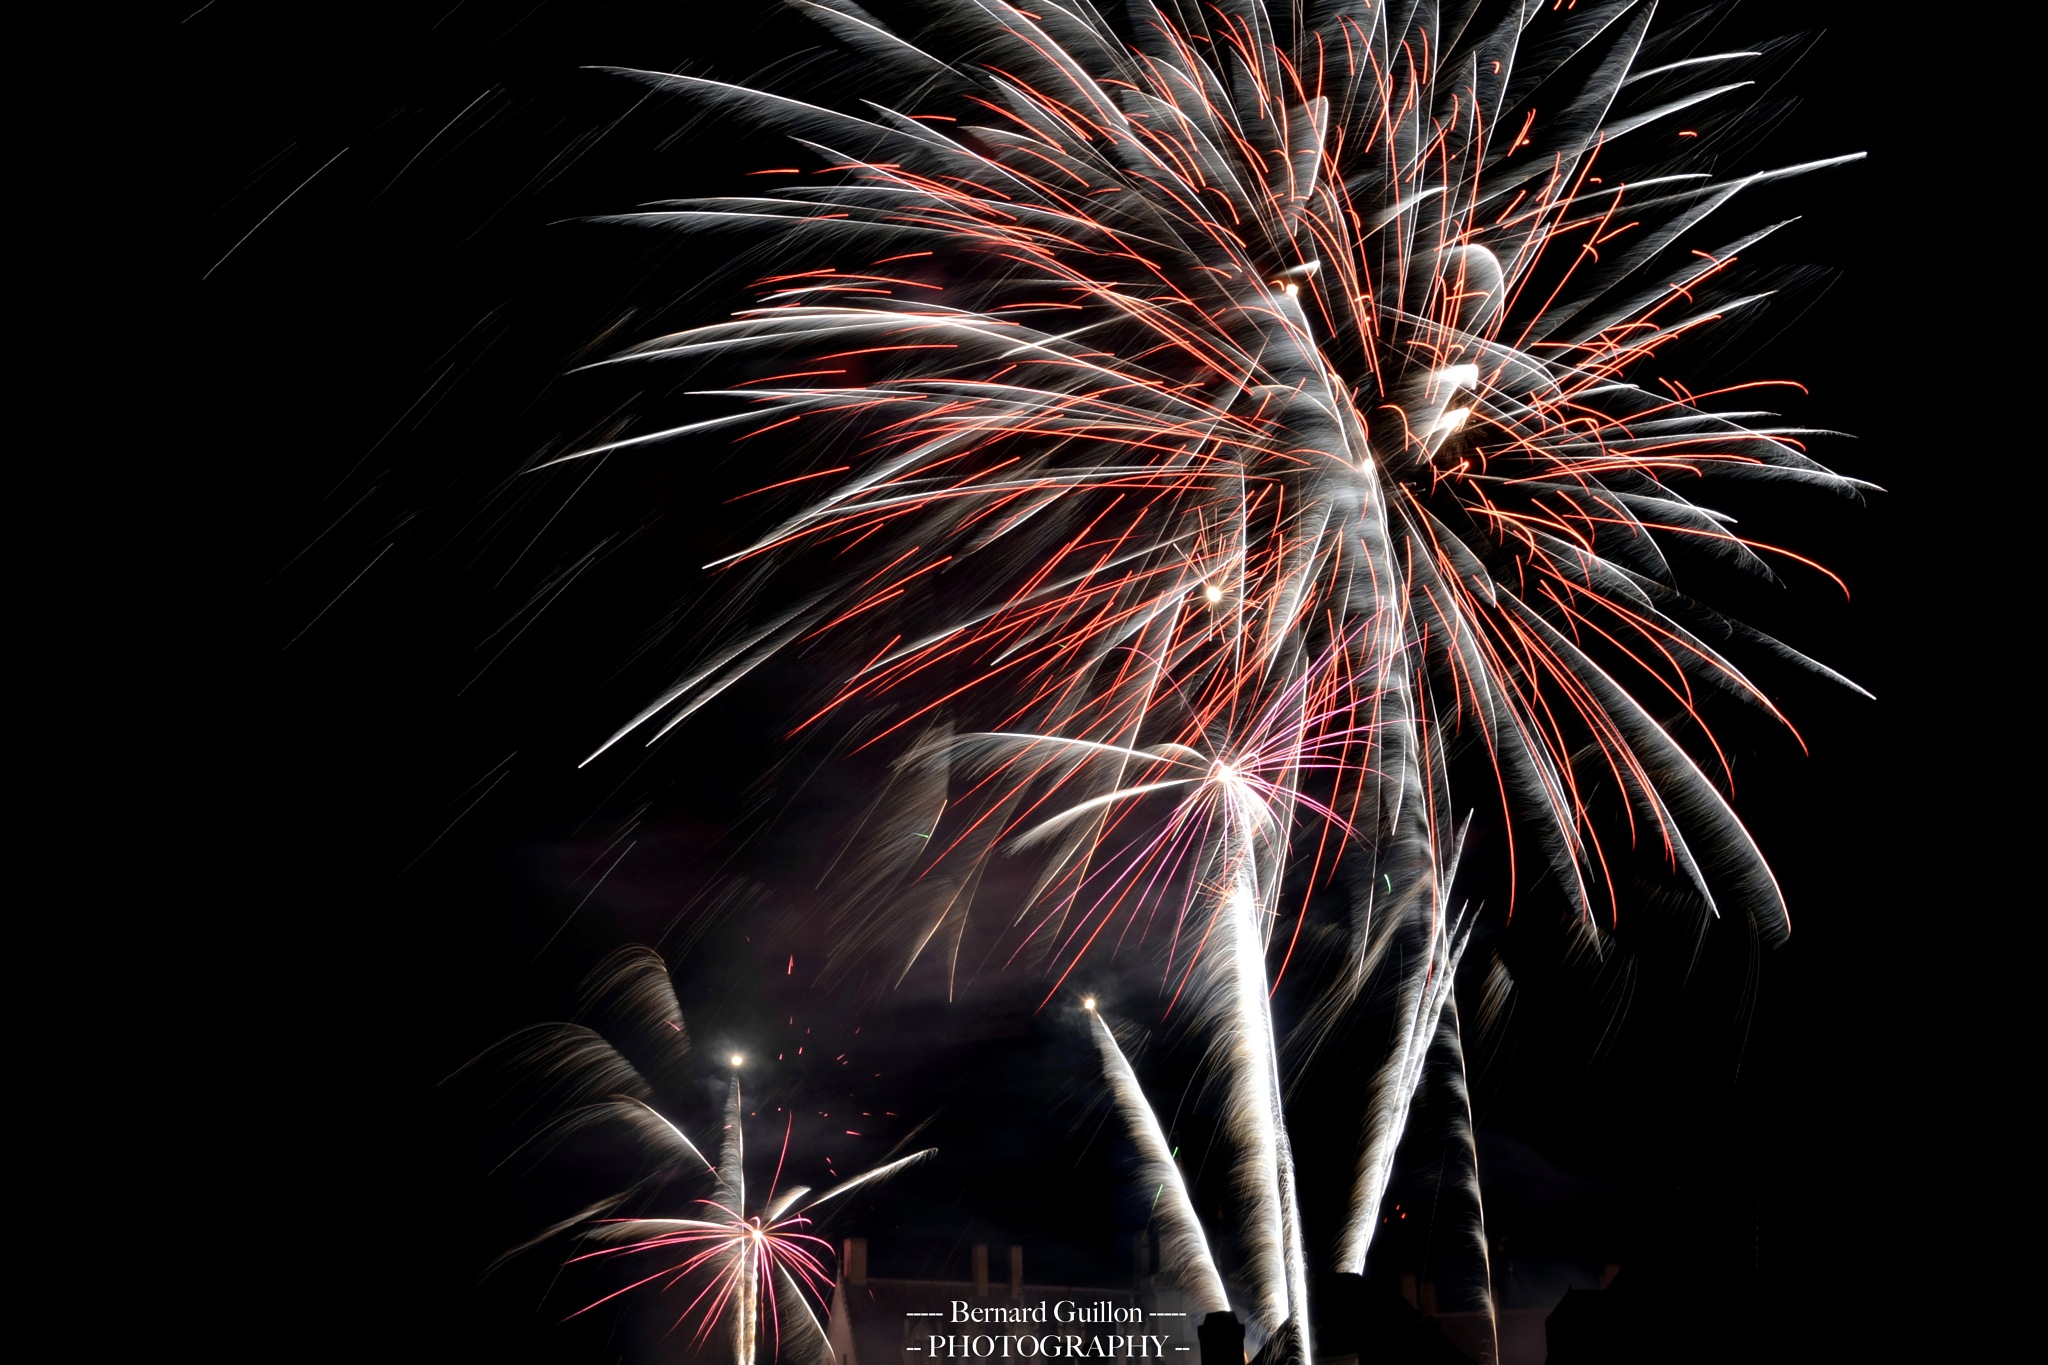 Artistic fireworks over the castle by Bernard Guillon